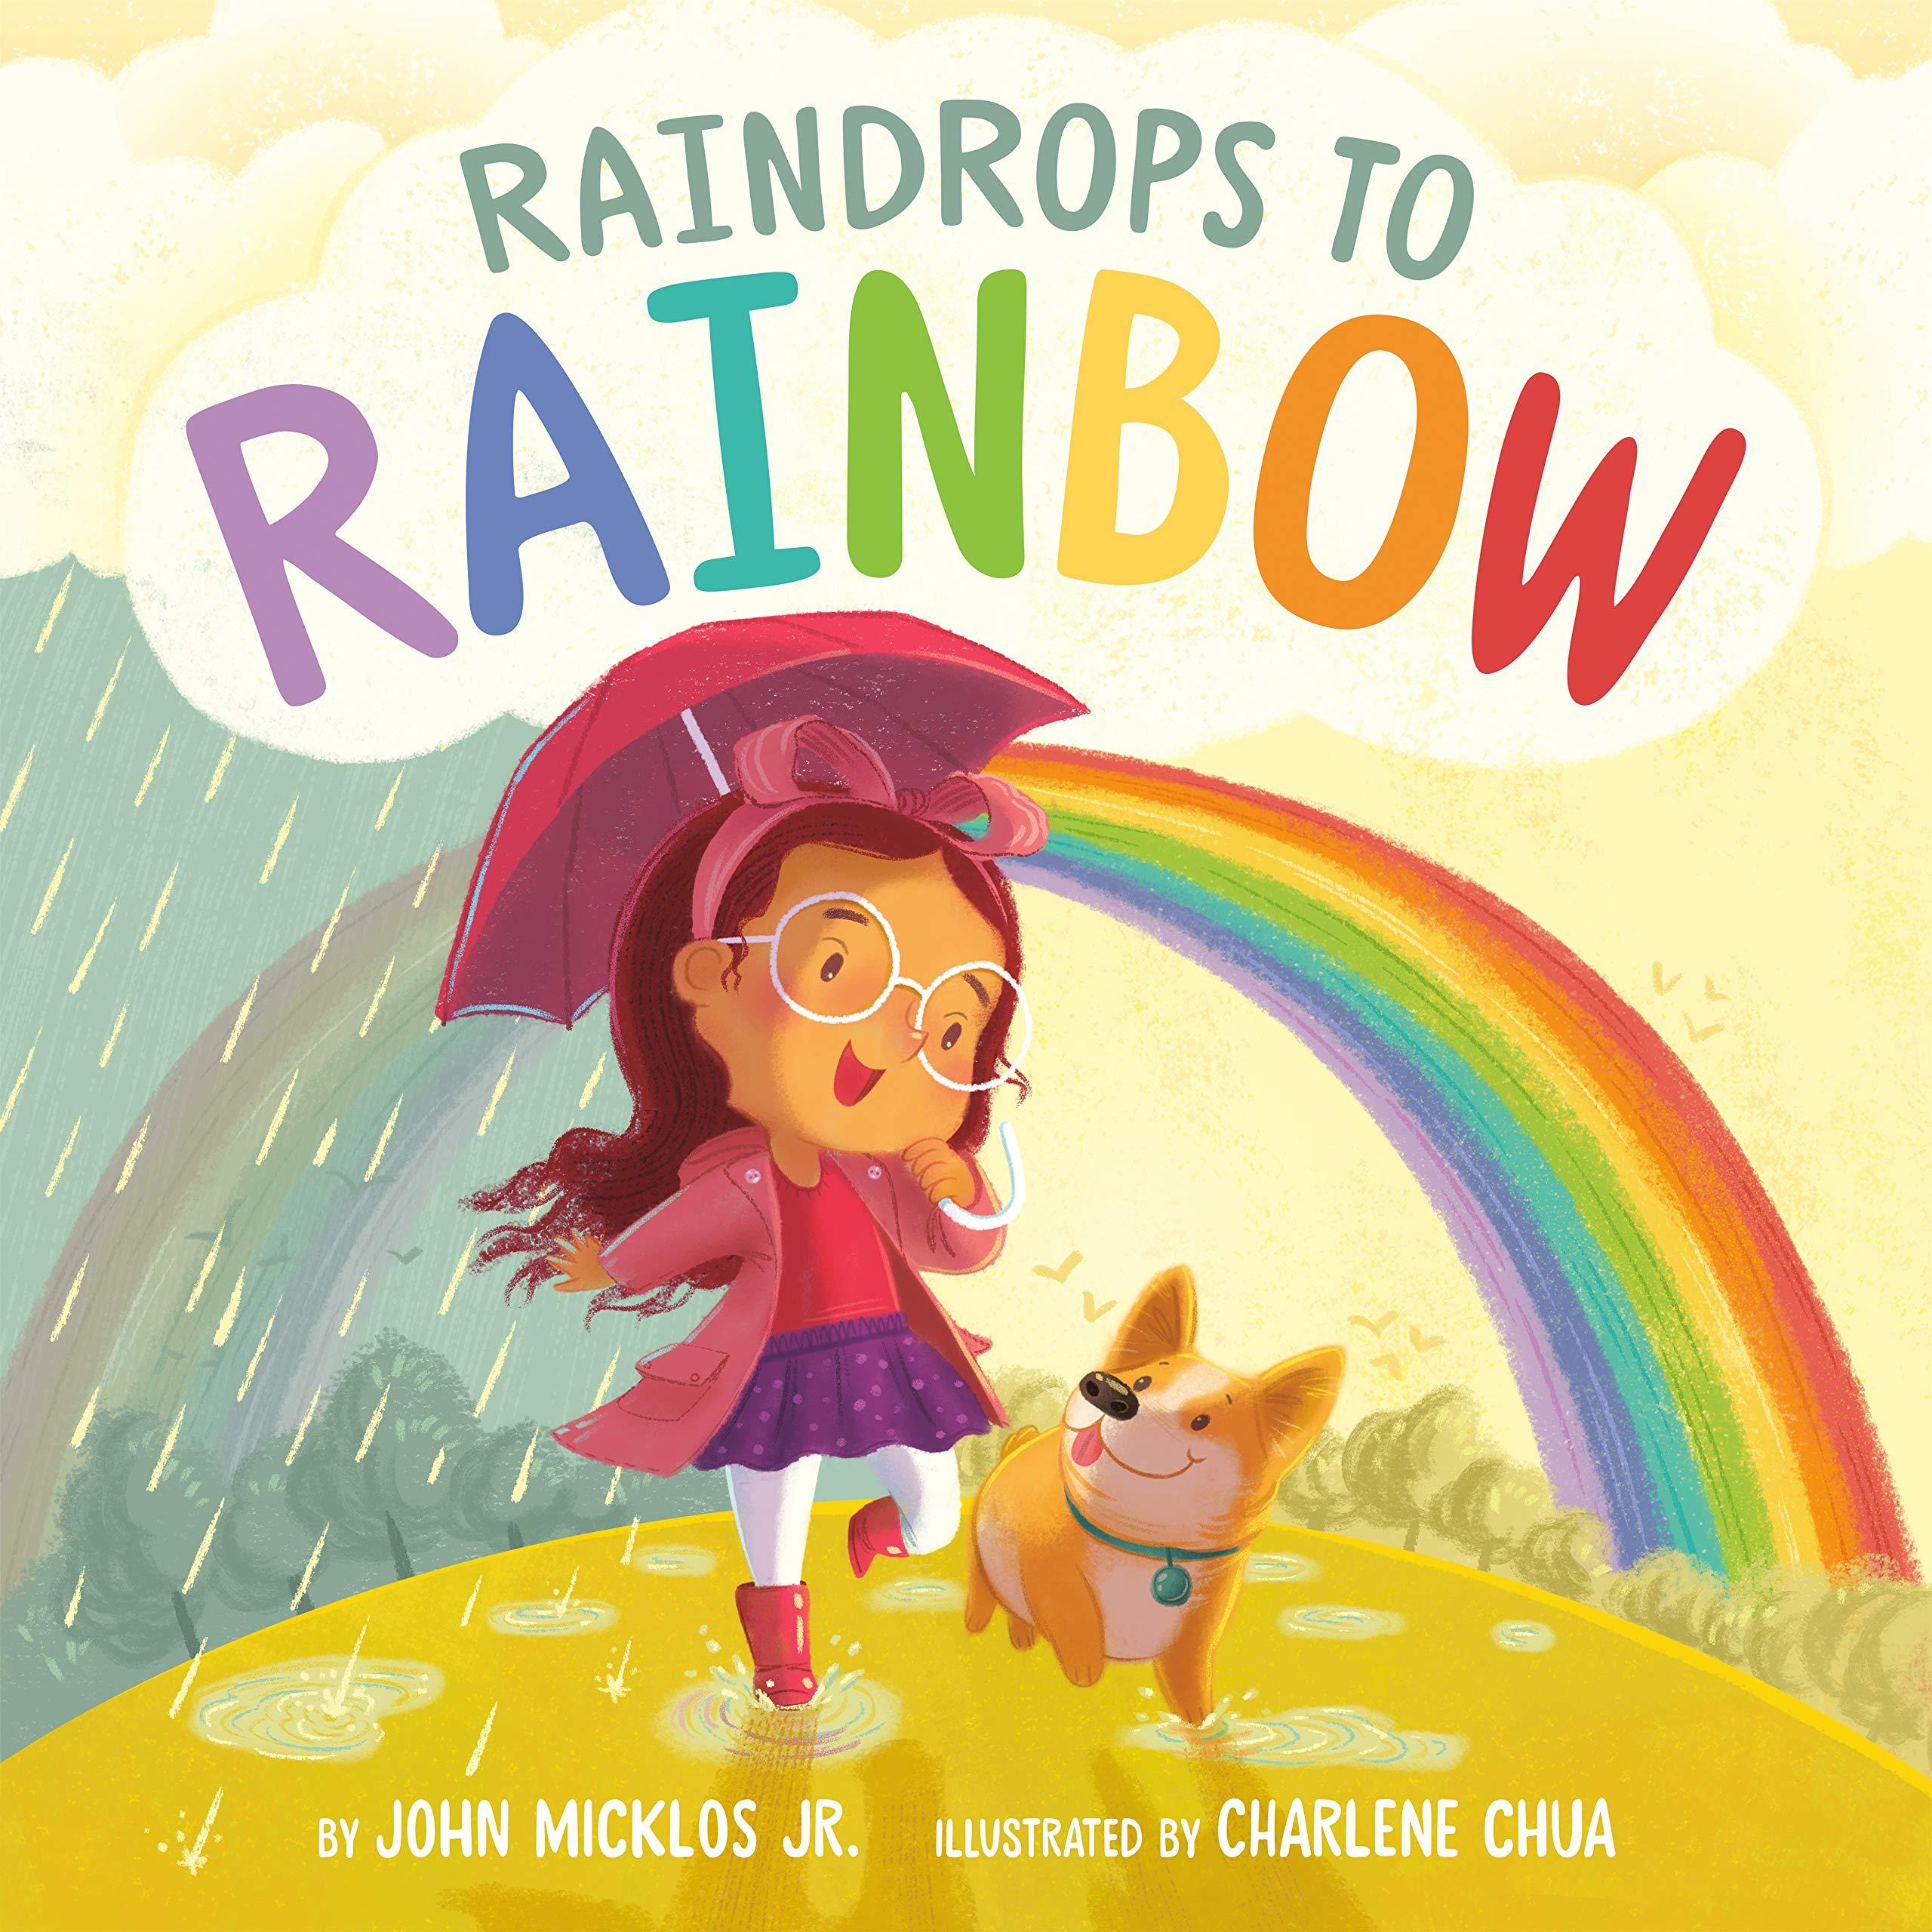 Amazon.com: Raindrops to Rainbow (9780593224090): Micklos Jr., John, Chua,  Charlene: Books